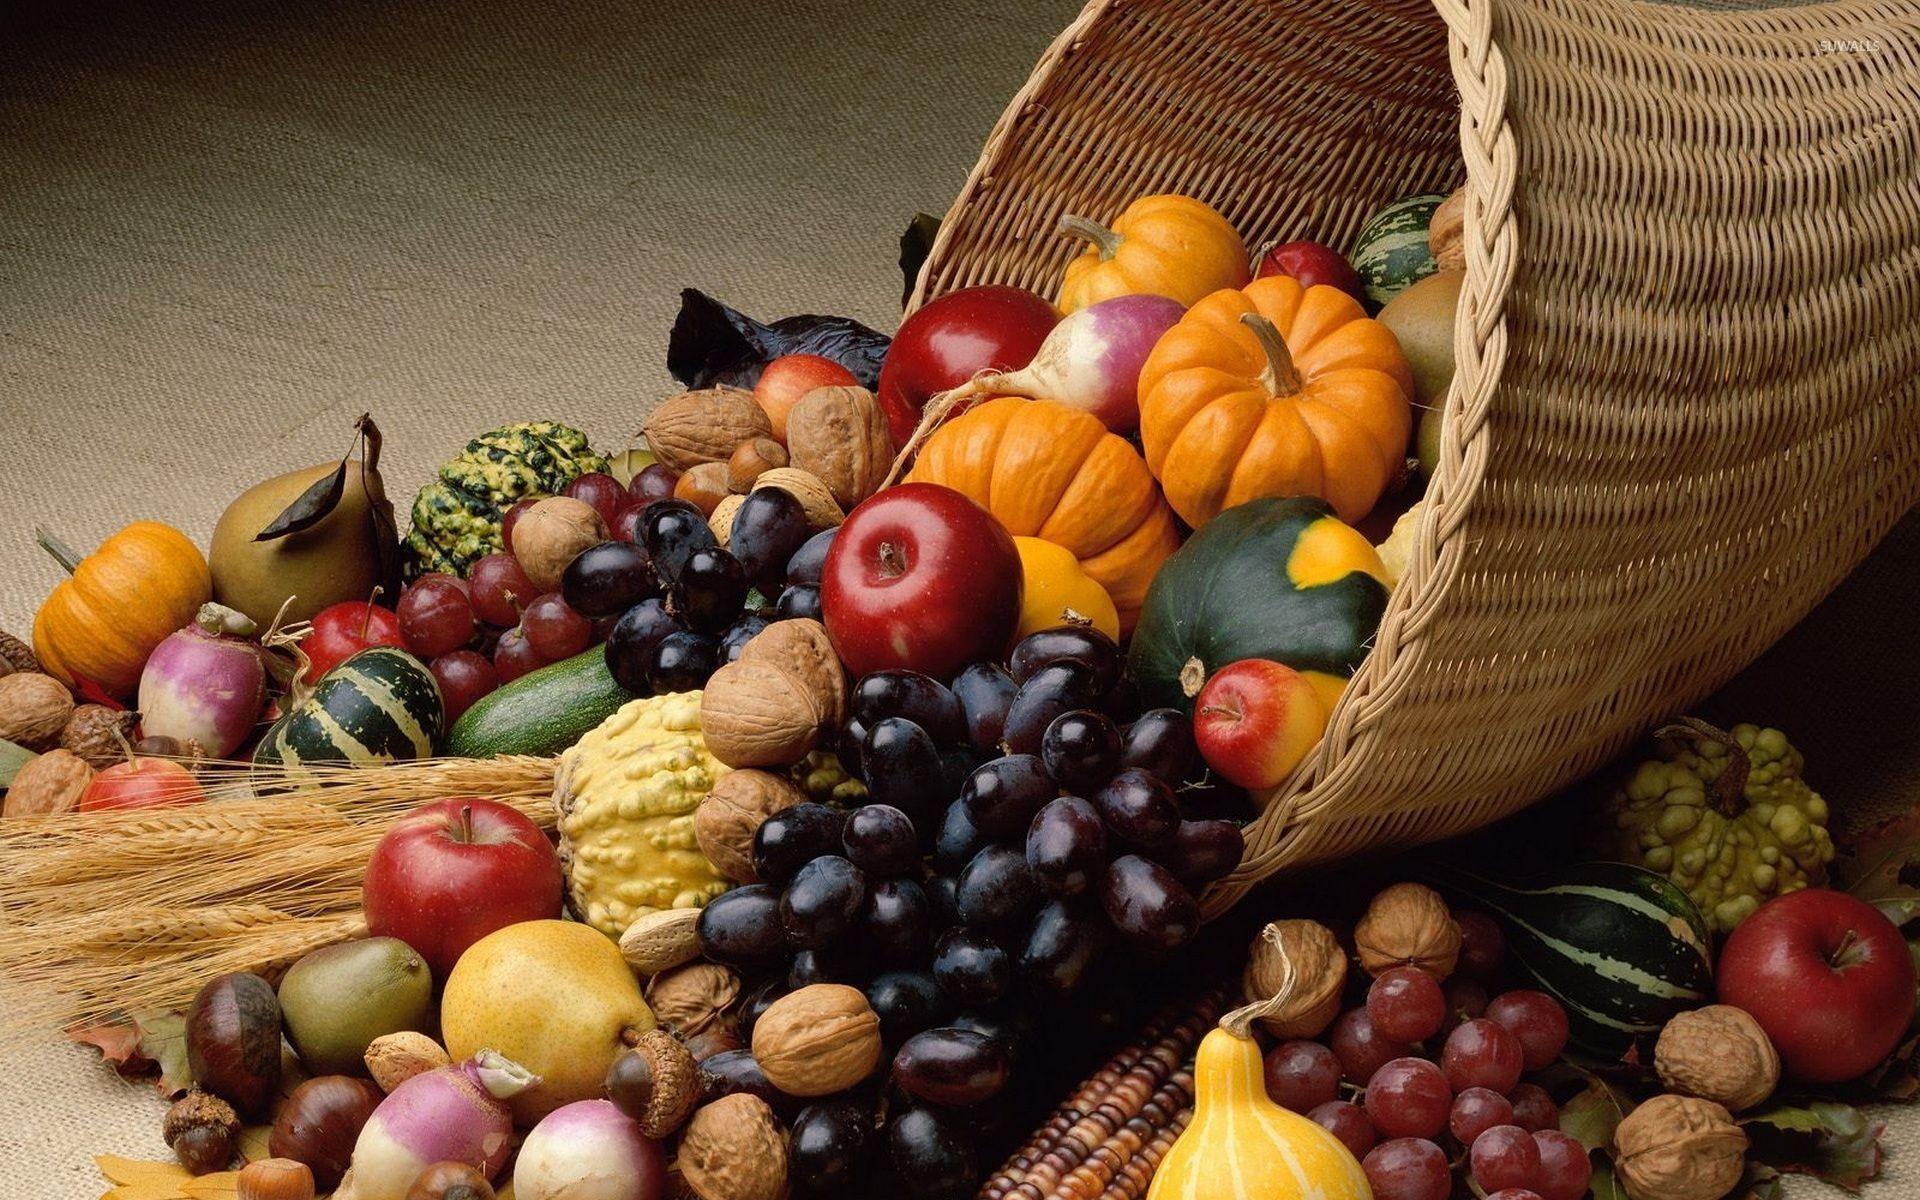 Cornucopia Thanksgiving Wallpaper